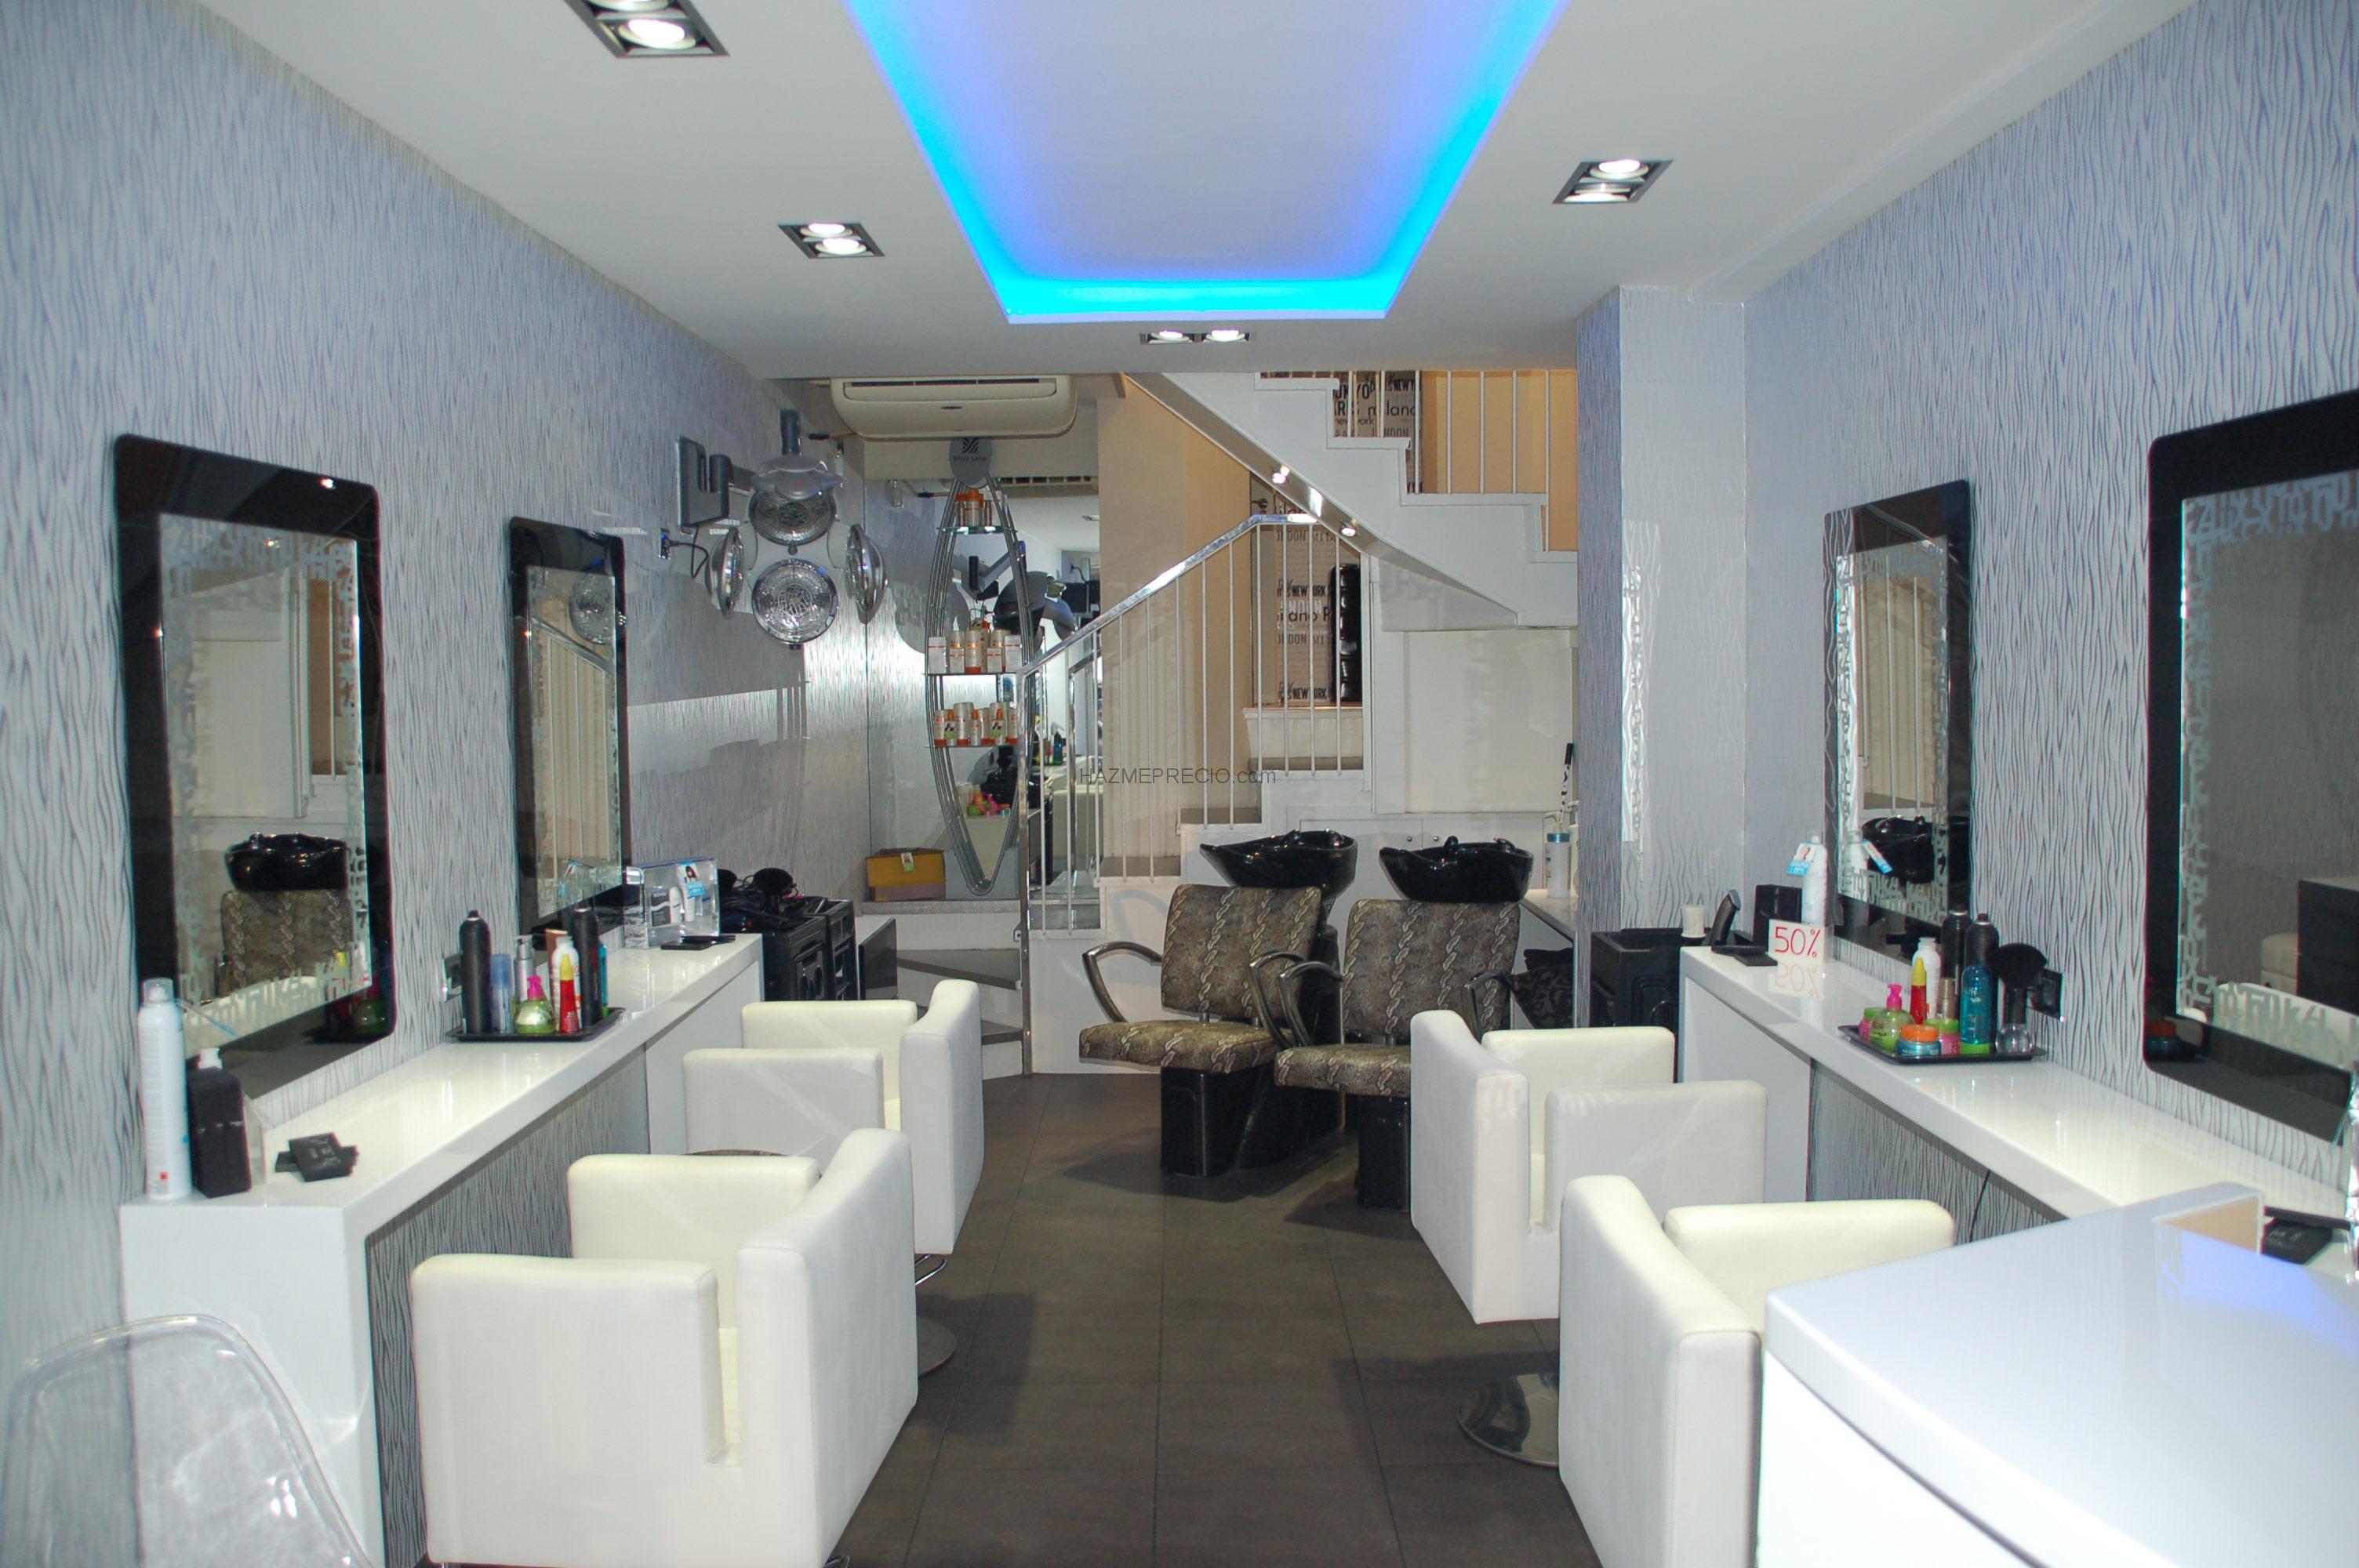 Empresas de pintura en cantabria for Decoracion de peluquerias